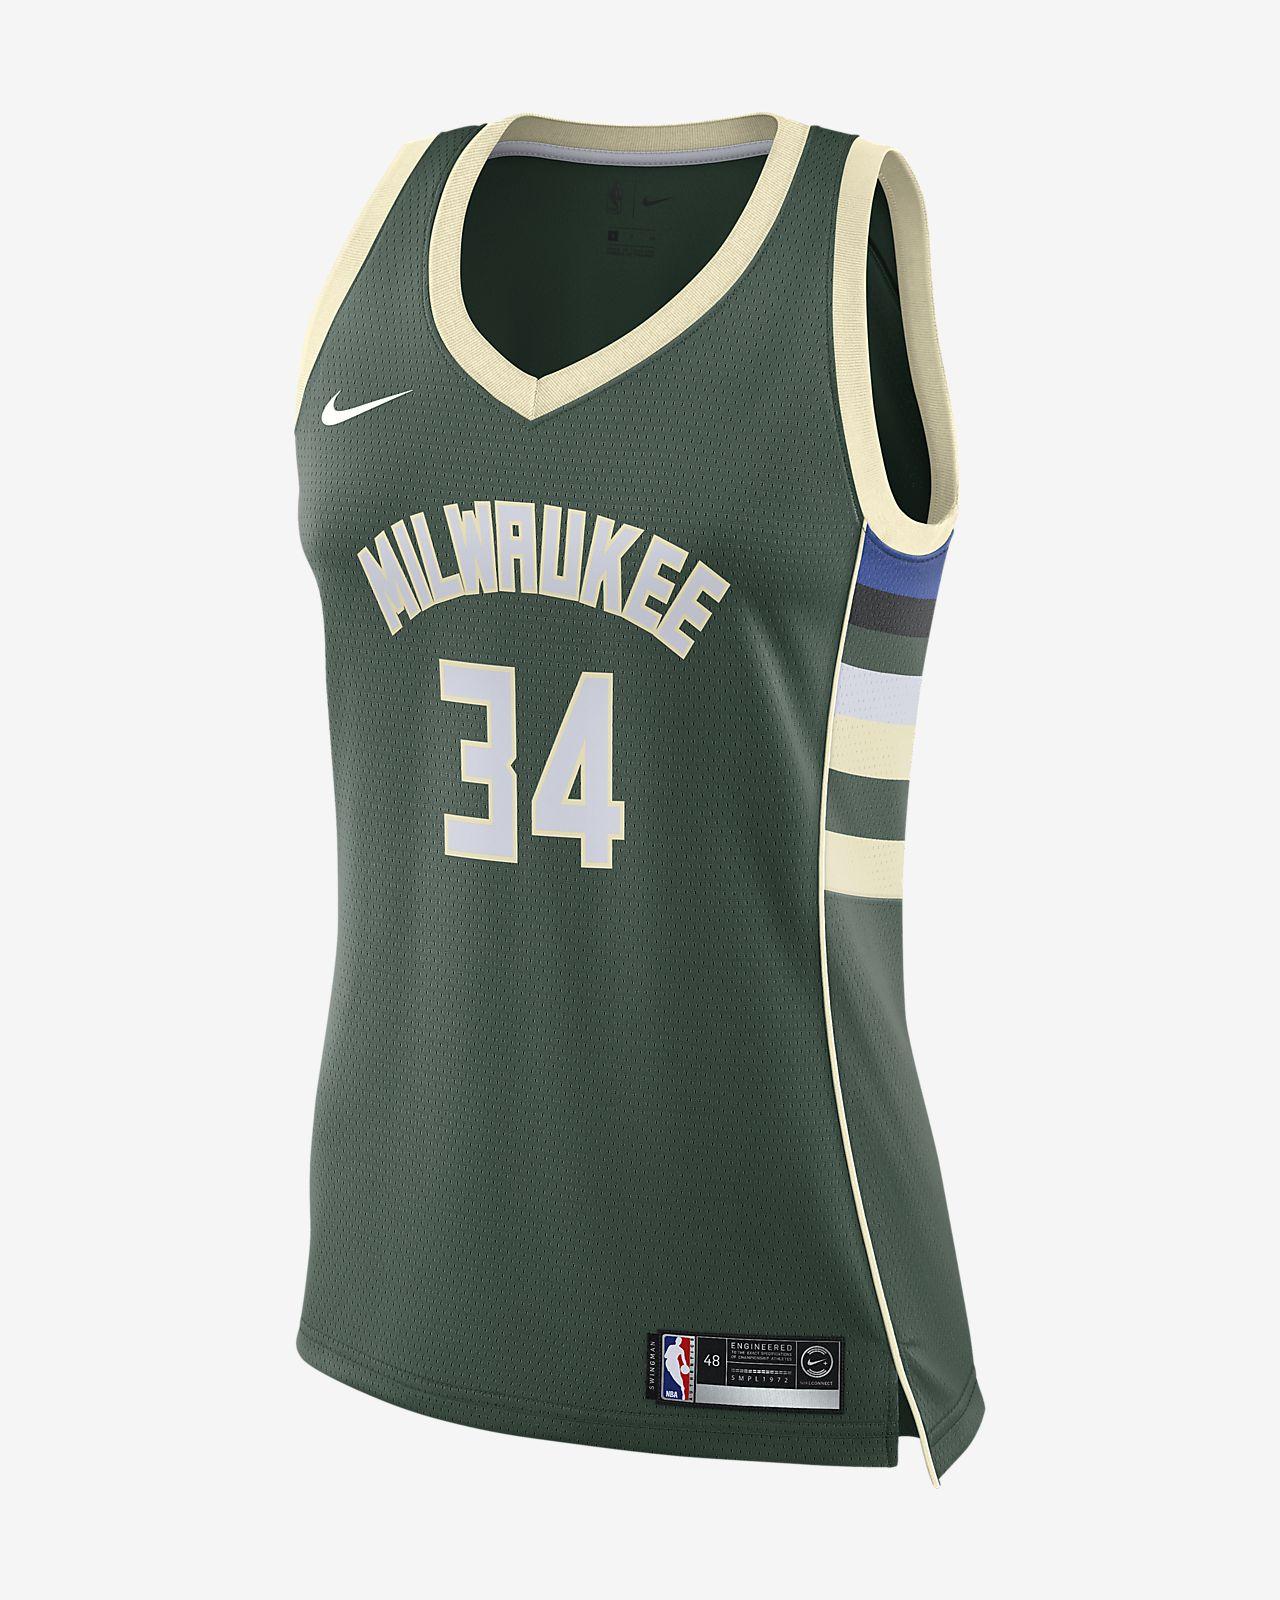 Women s Nike NBA Connected Jersey. Giannis Antetokounmpo Icon Edition  Swingman (Milwaukee Bucks) 233b08cc6